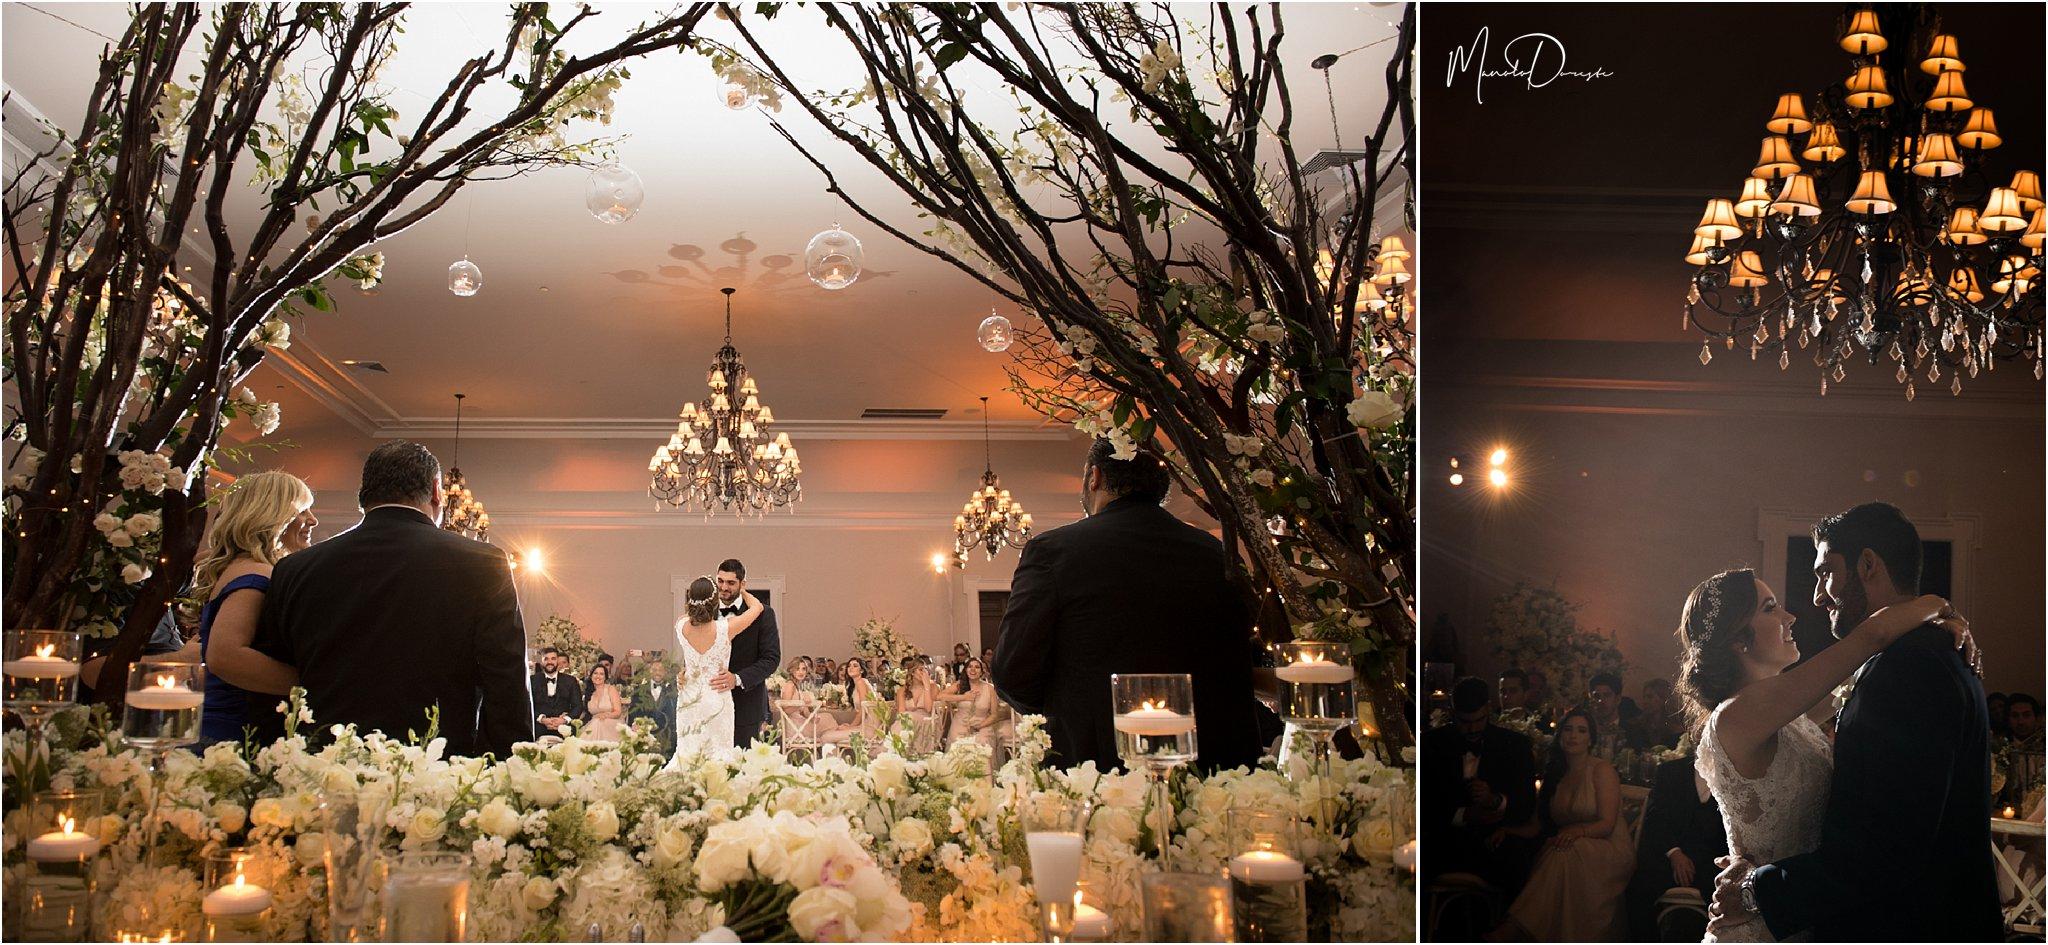 00943_ManoloDoreste_InFocusStudios_Wedding_Family_Photography_Miami_MiamiPhotographer.jpg